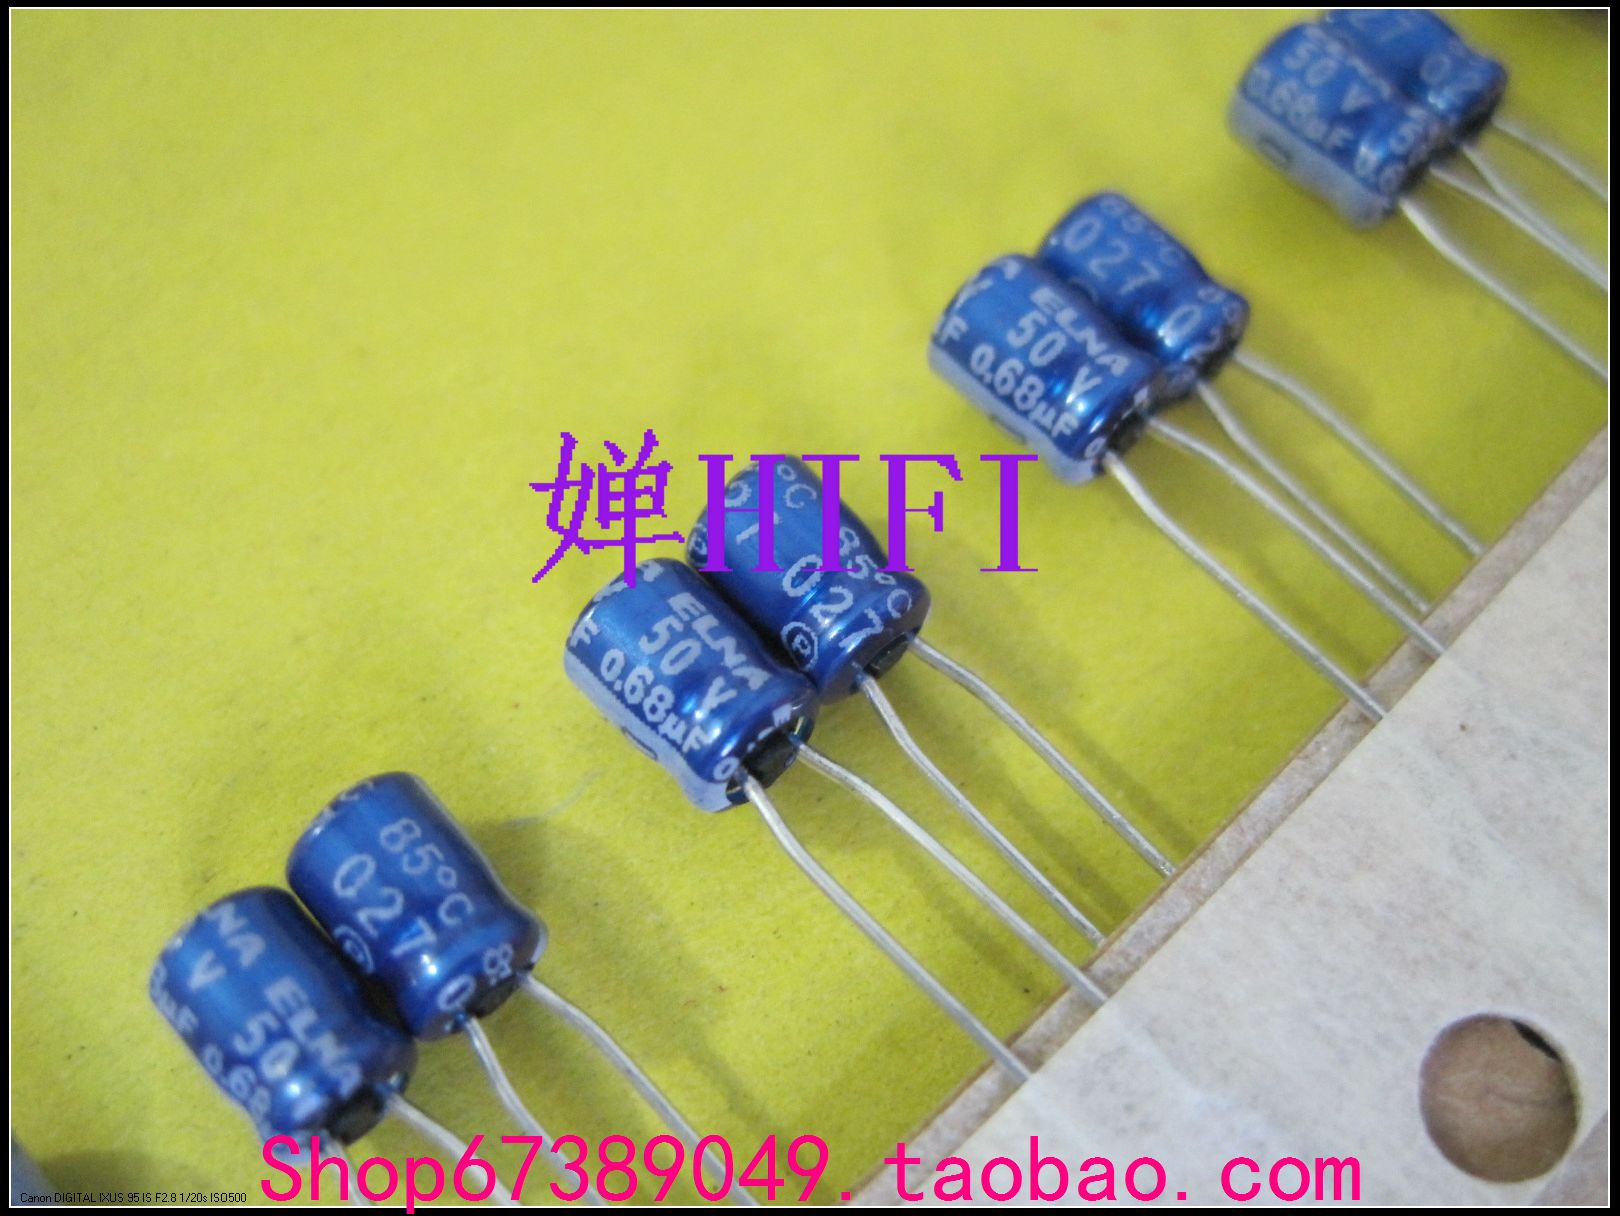 2020 hot sale 20PCS/50PCS ELNA original blue robe RC2 electrolytic capacitor 50v0.68uf 4x5mm free shipping 2020 hot sale holland bc 20pcs 50pcs 82pf 100v 2